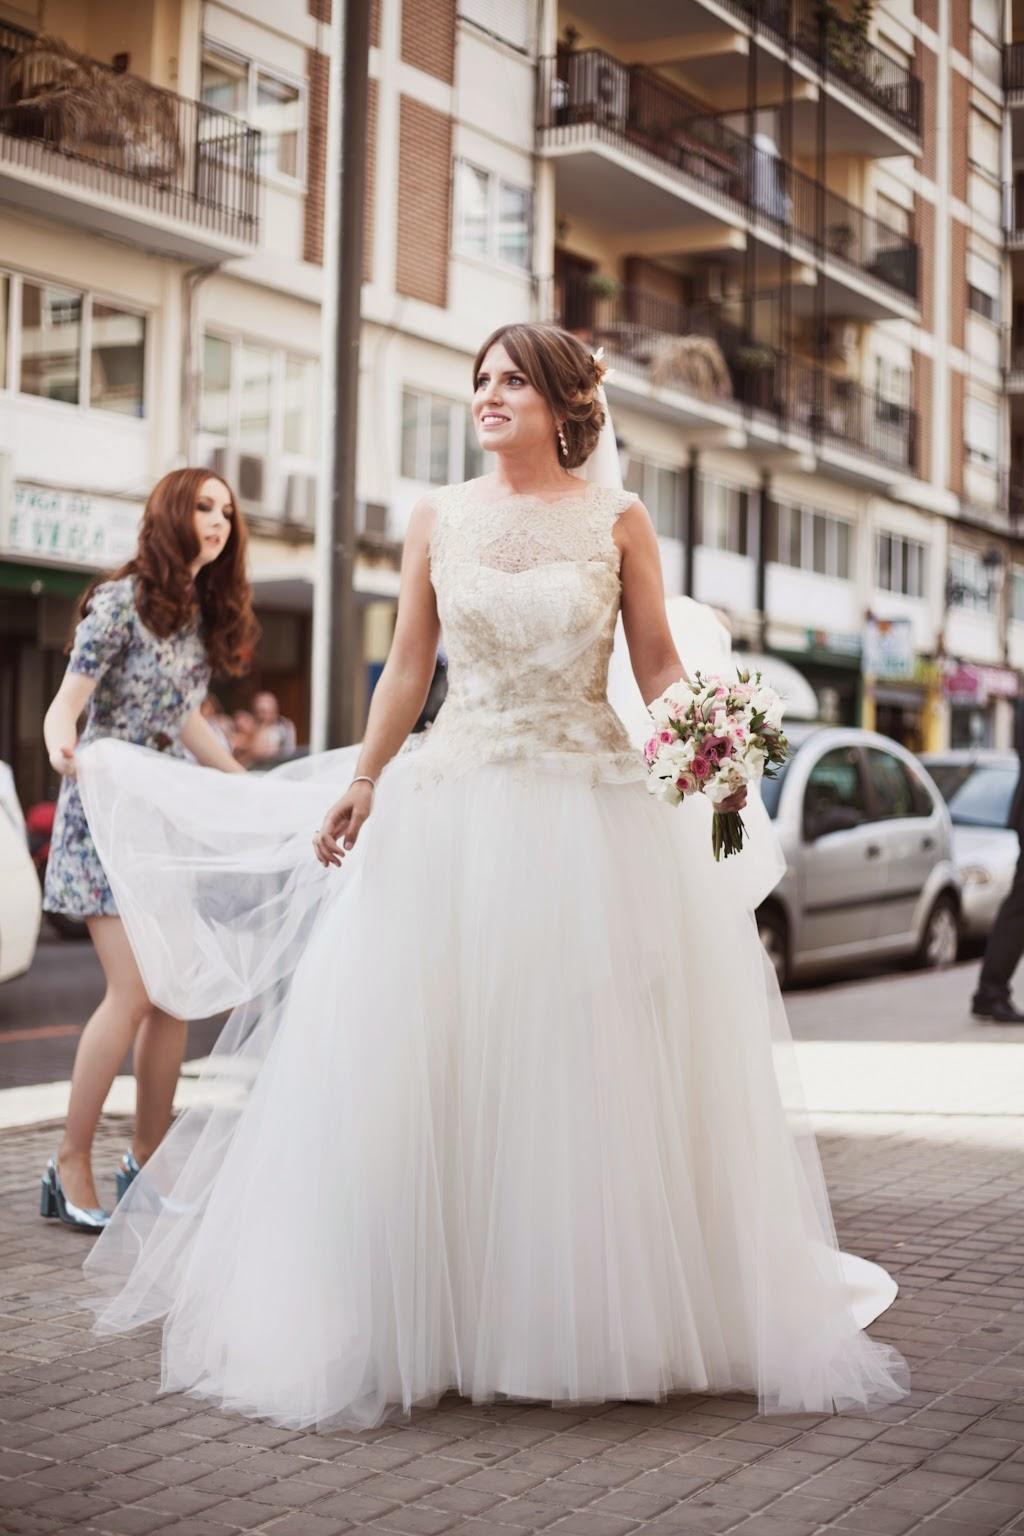 Vestido de novia de San Antonio — Cuadros